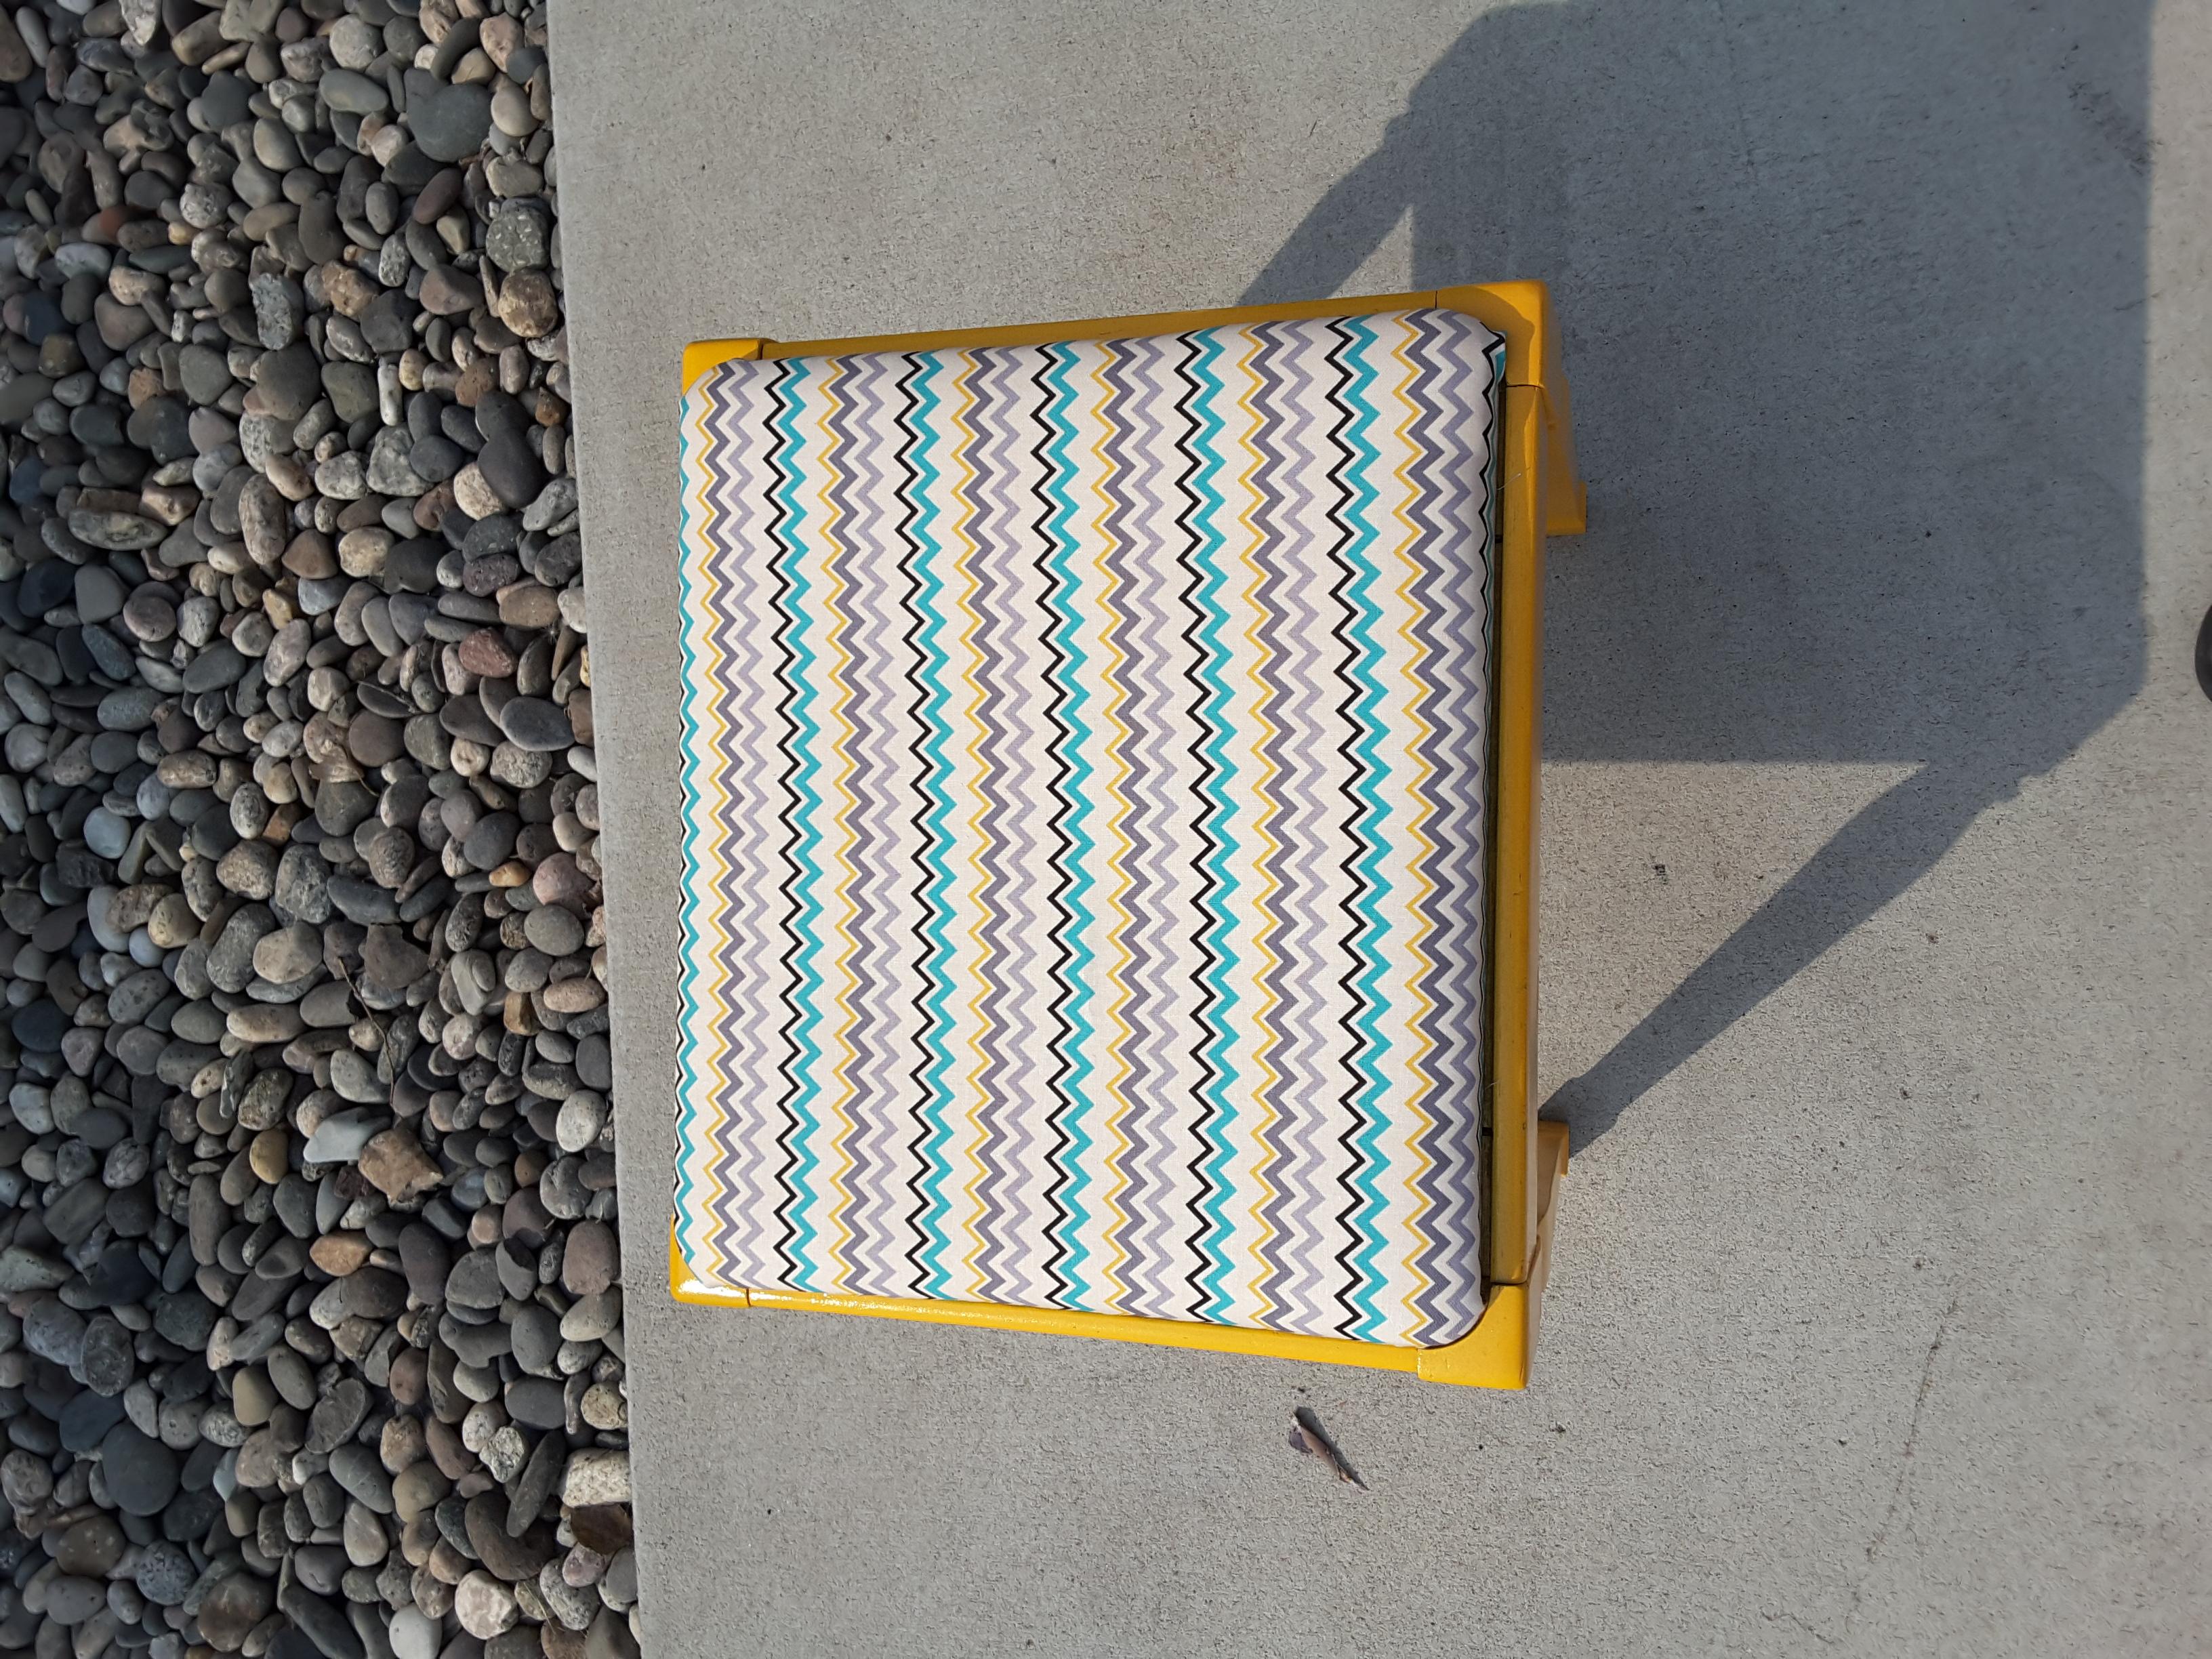 Refurbished stool